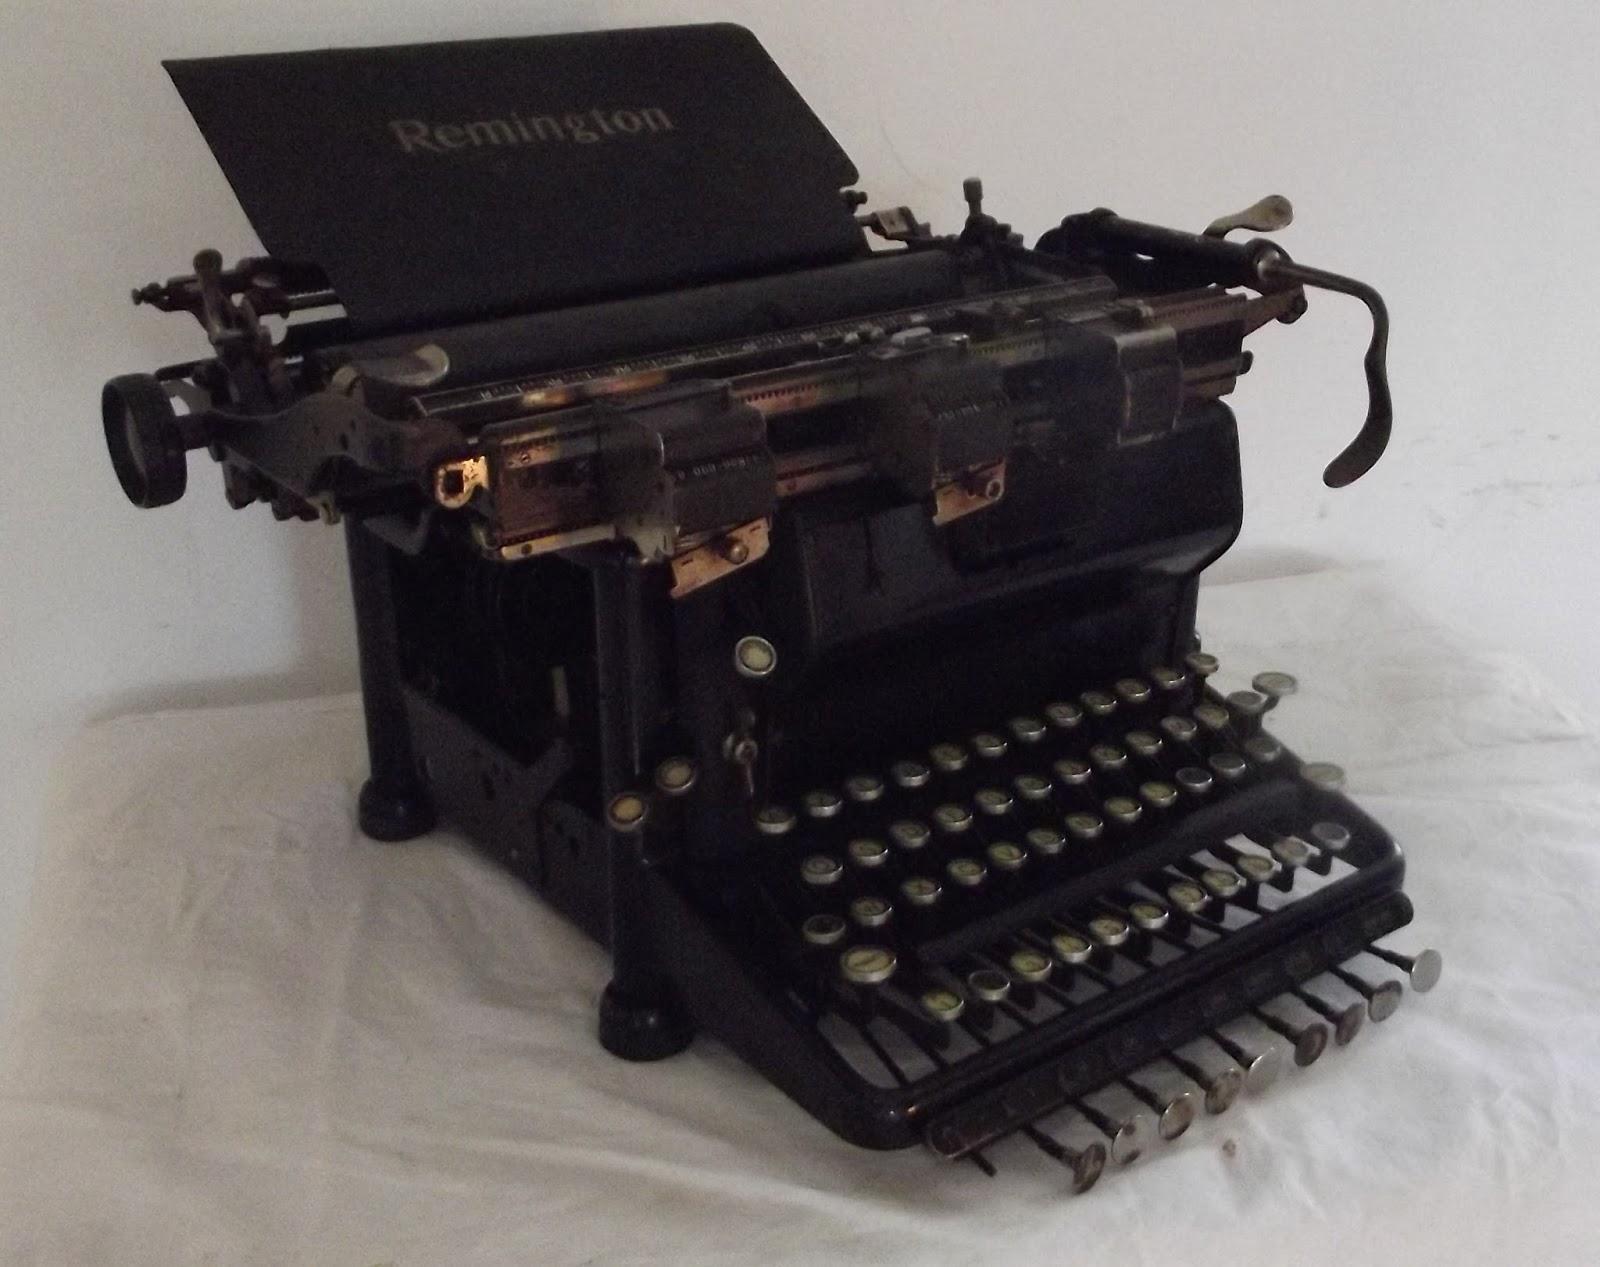 machine a crire remington touches tabulation d cimales ancien decimal. Black Bedroom Furniture Sets. Home Design Ideas